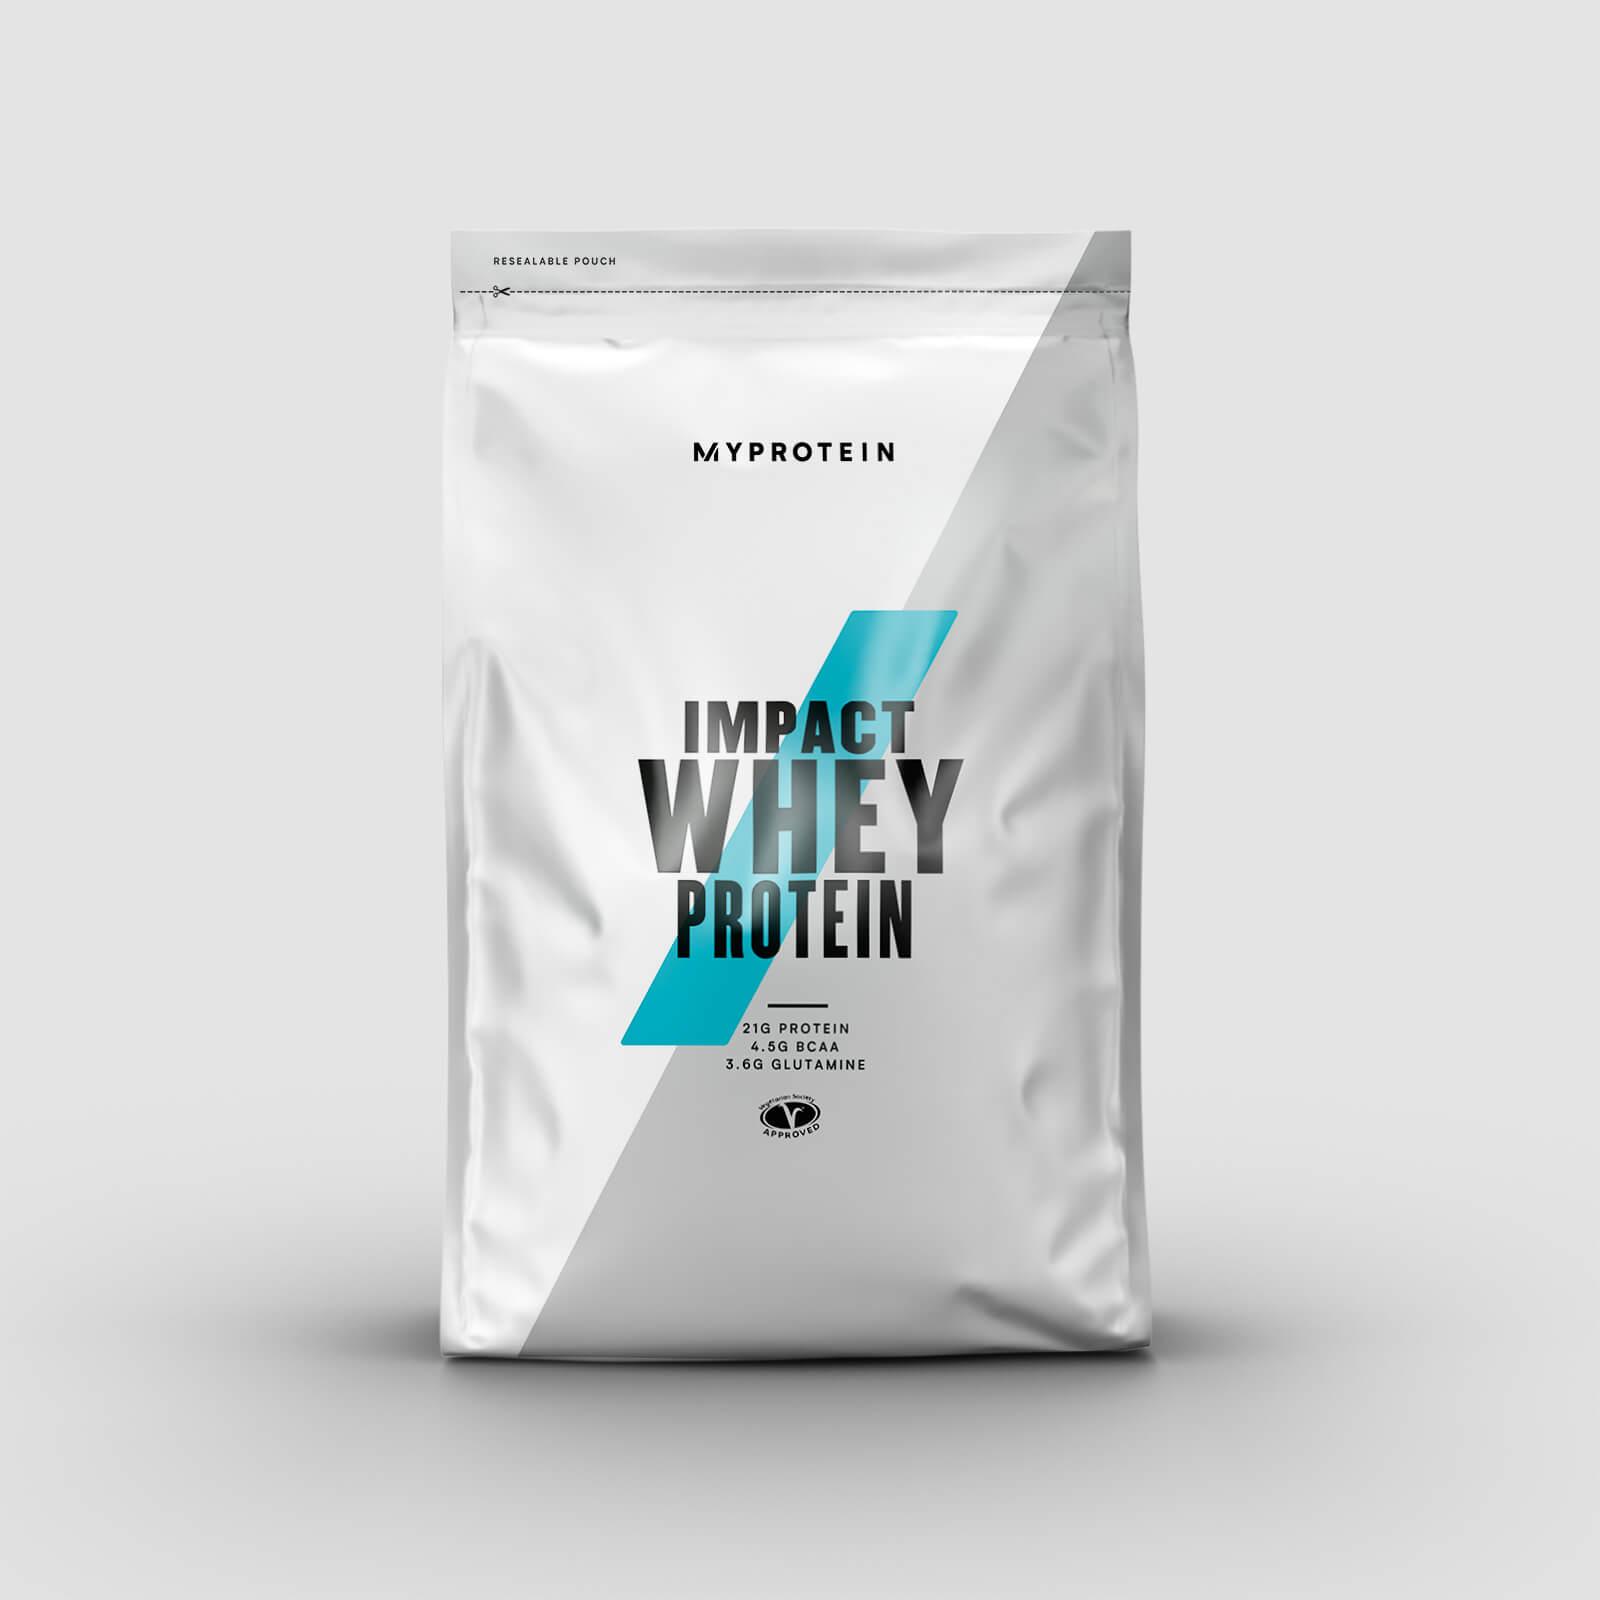 Myprotein Impact Whey Protein 250g - 250g - Chocolat Onctueux